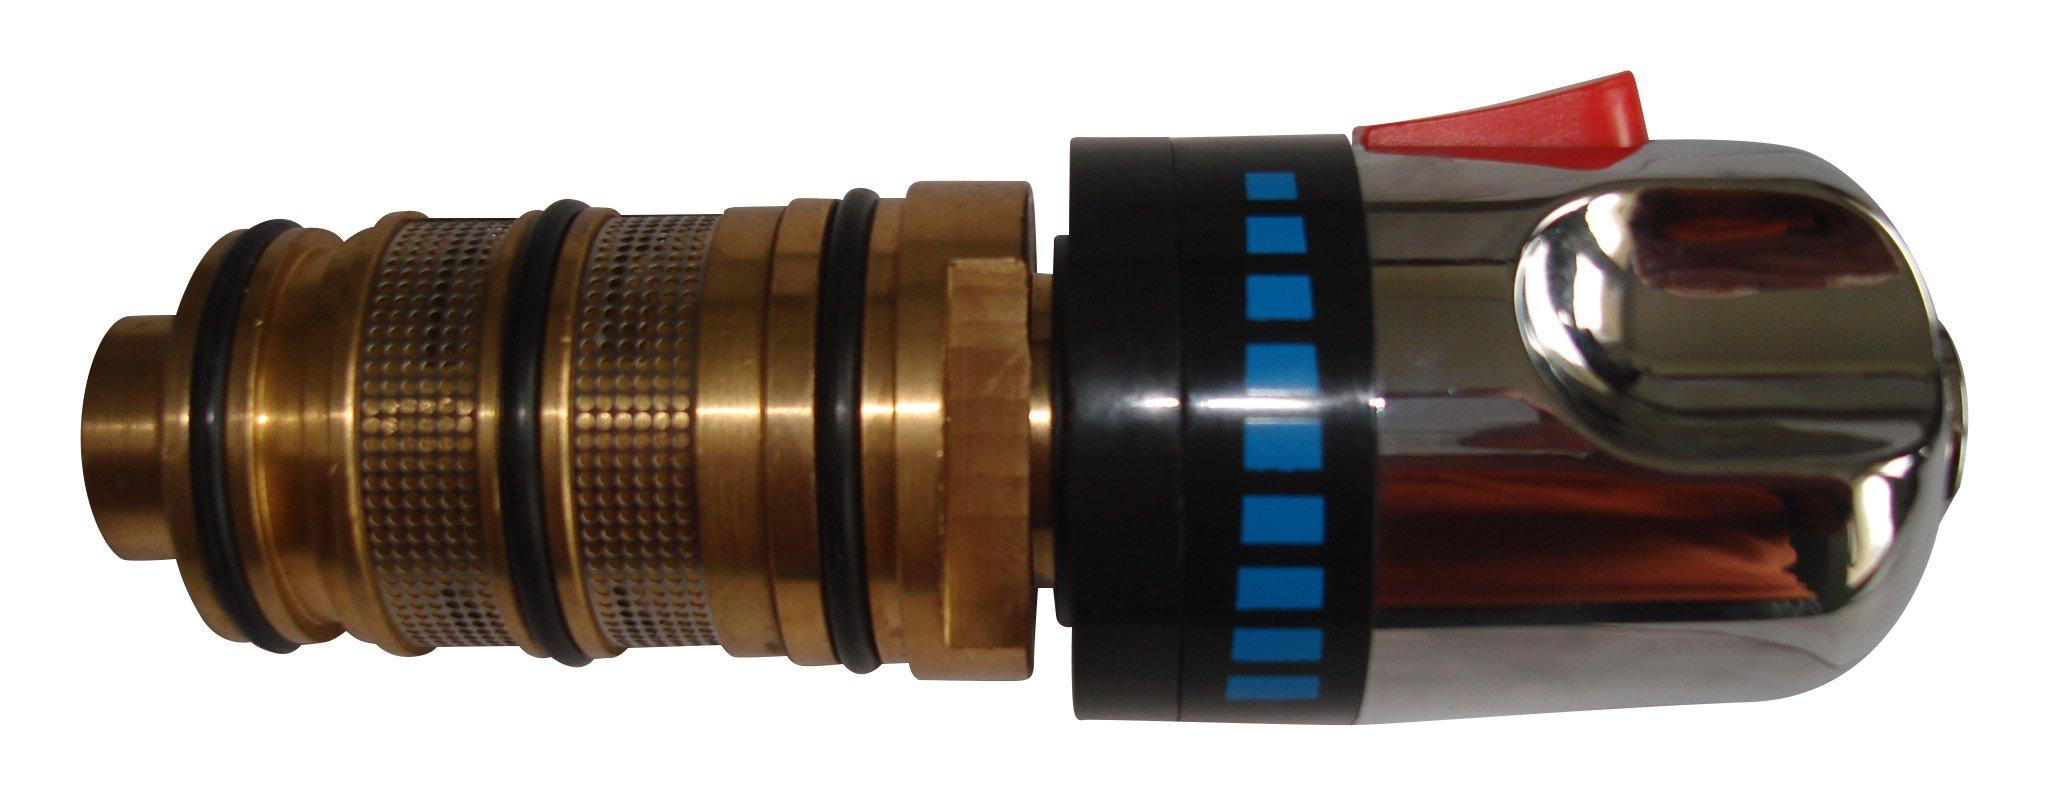 Thermostatic Bath Mixer Tap Taps Shower Valve Repair Cartridge Kit /& Handles